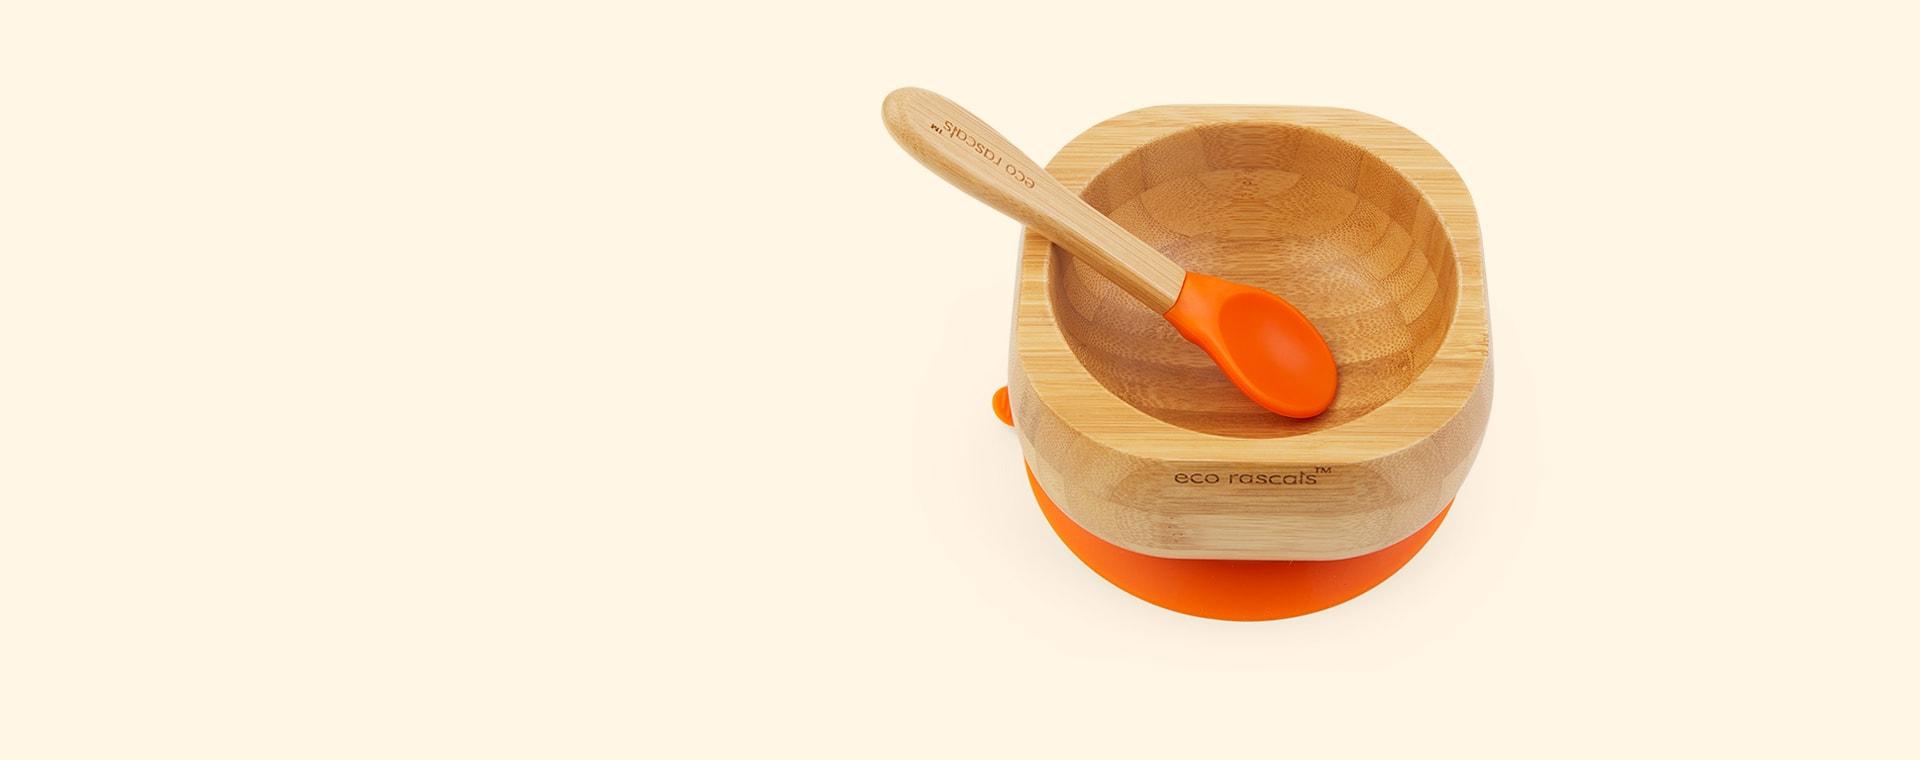 Orange eco rascals Bamboo Suction Bowl and Spoon Set